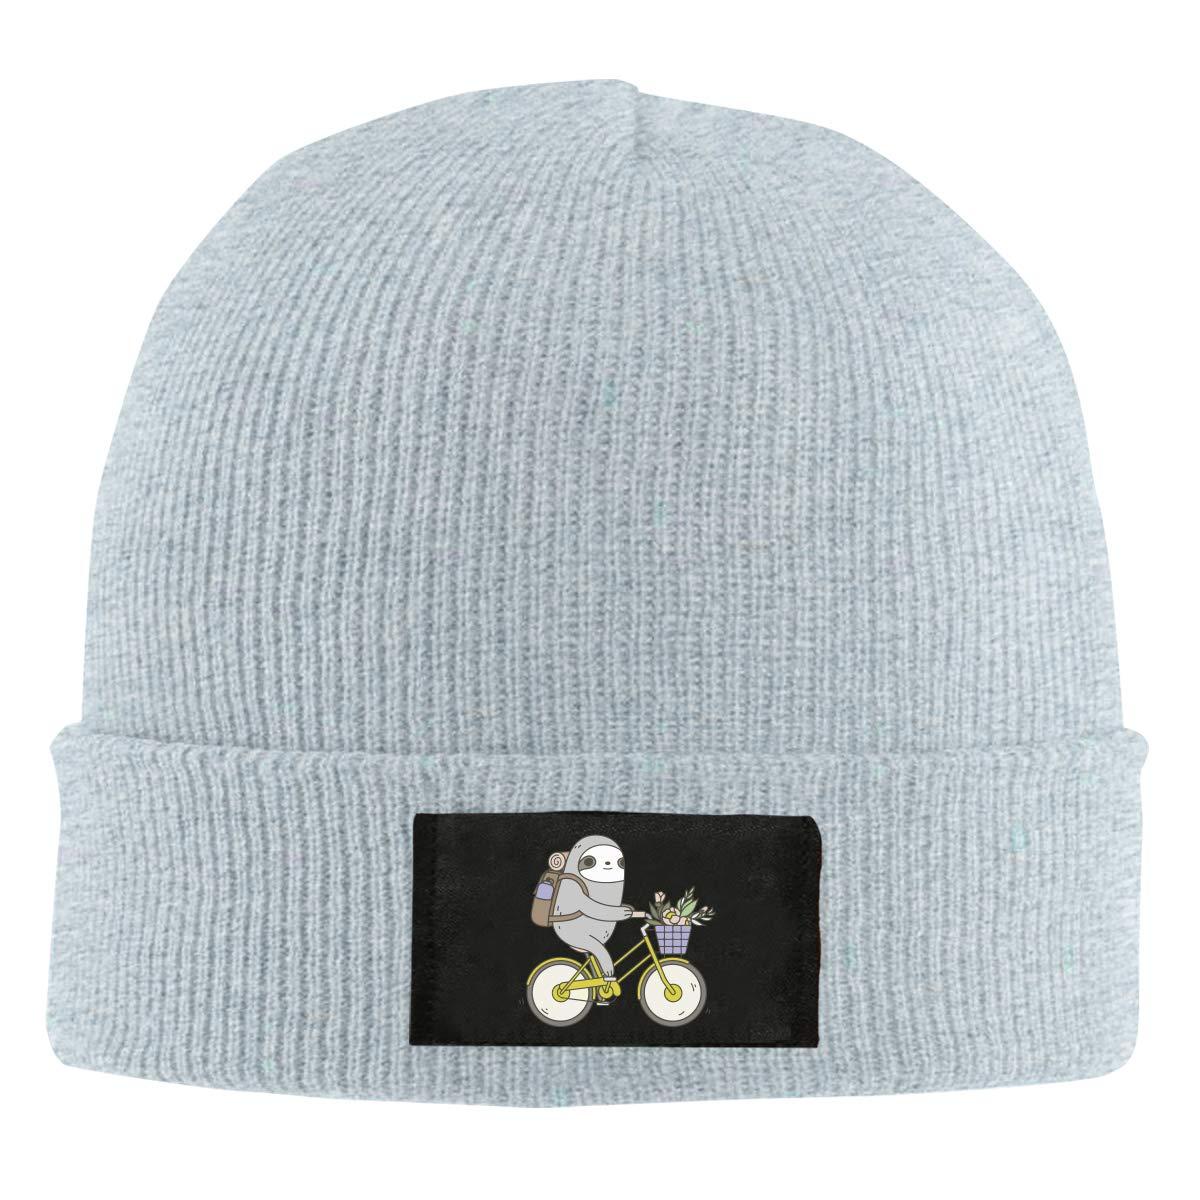 ASDGEGASFAS Unisex Biking Sloth Skull Cap Knit Wool Beanie Hat Stretchy Solid Daily Wear